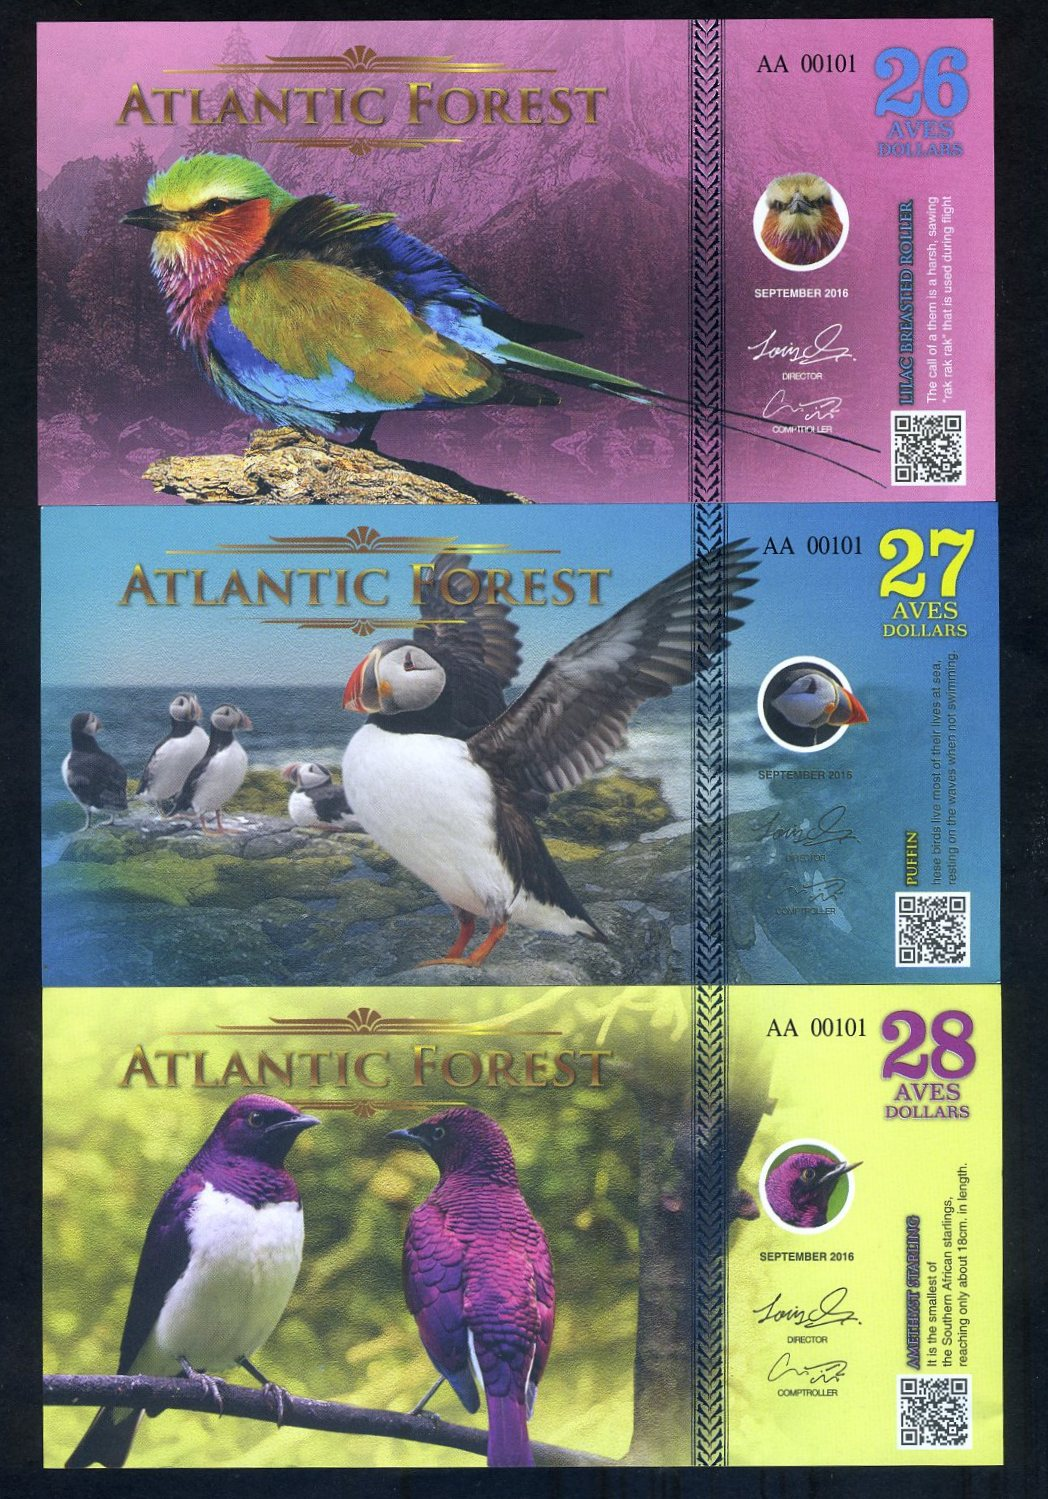 ATLANTIC FOREST 31 AVES DOLLARS BIRD BLUE JAY 2017 UNC